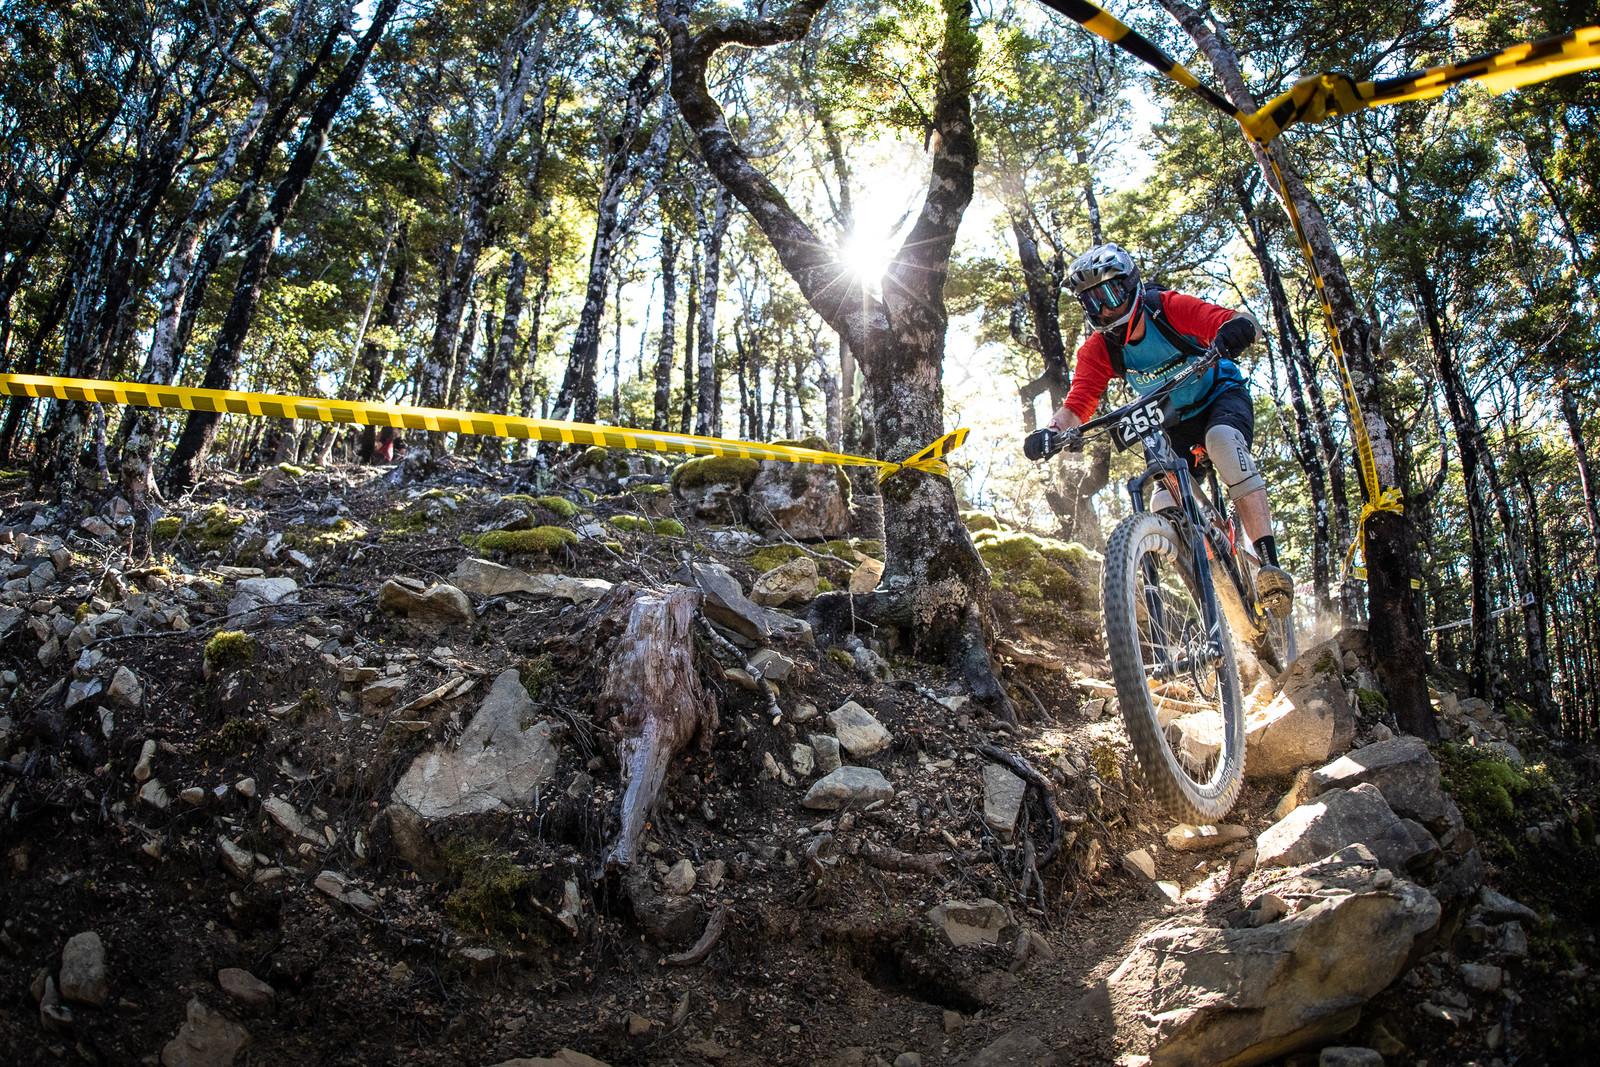 Max Gough - 2019 Dodzy Memorial Enduro - Mountain Biking Pictures - Vital MTB